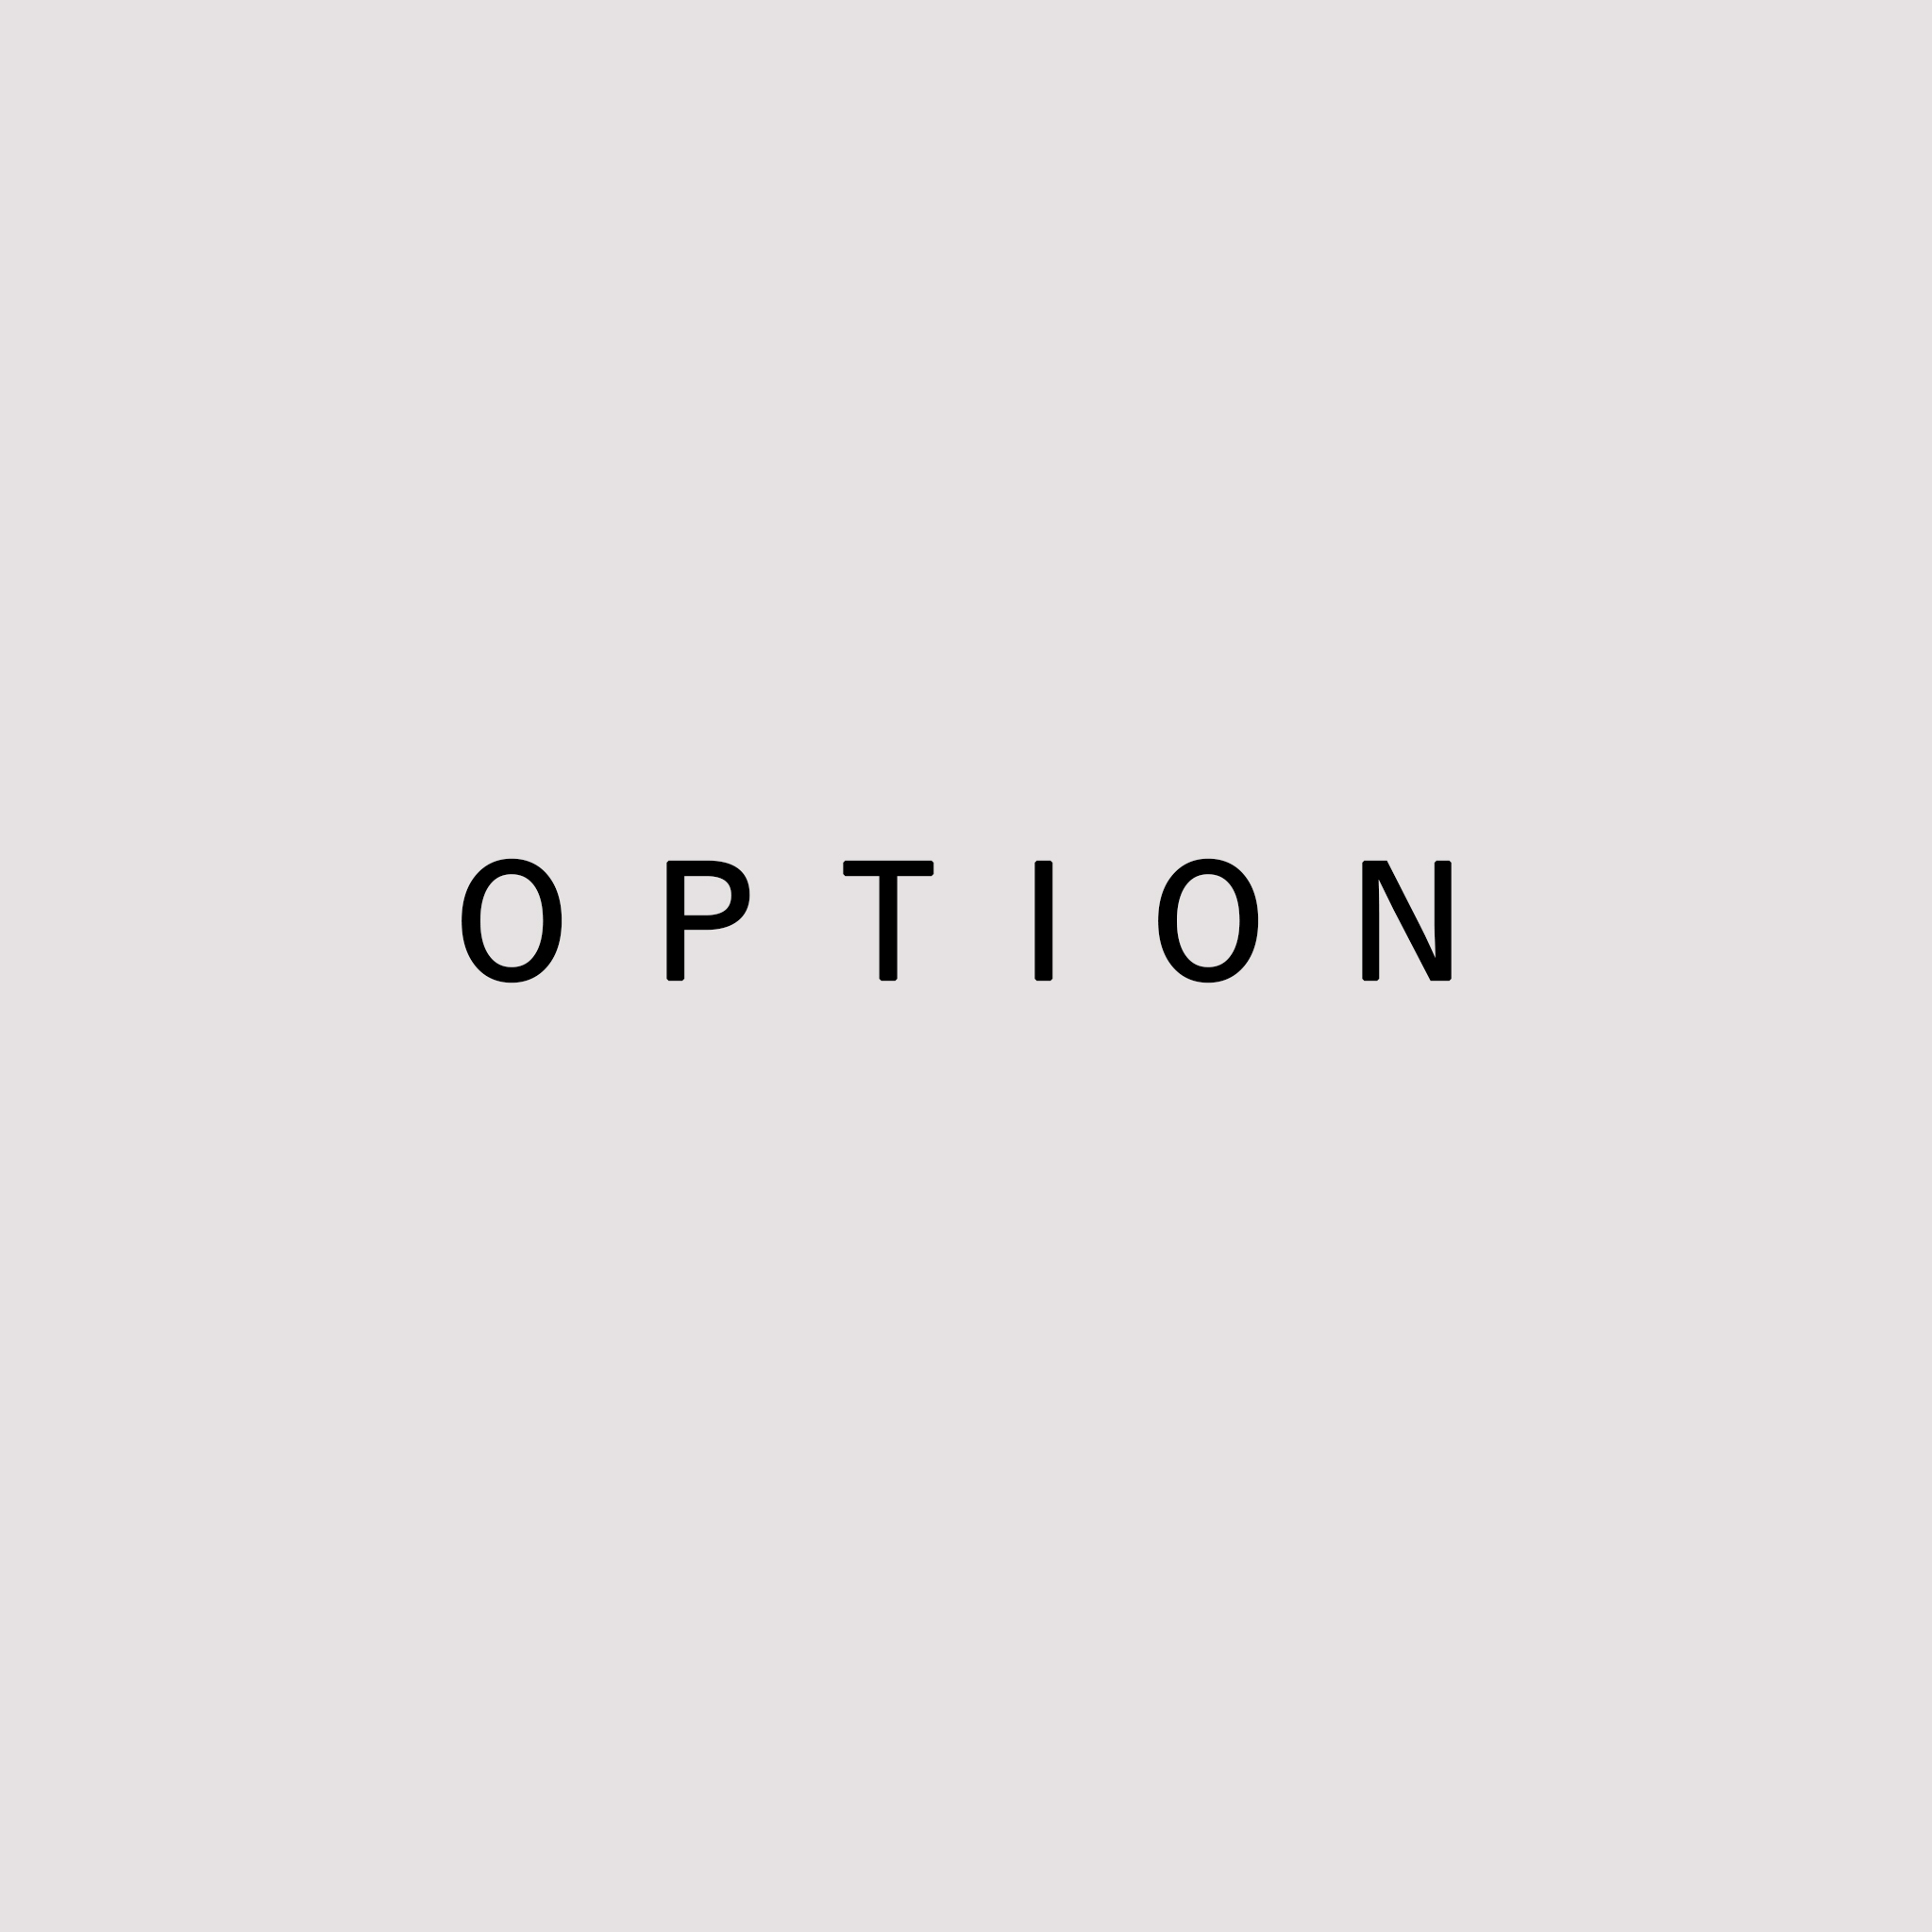 OPTION 《 2,000 yen 》